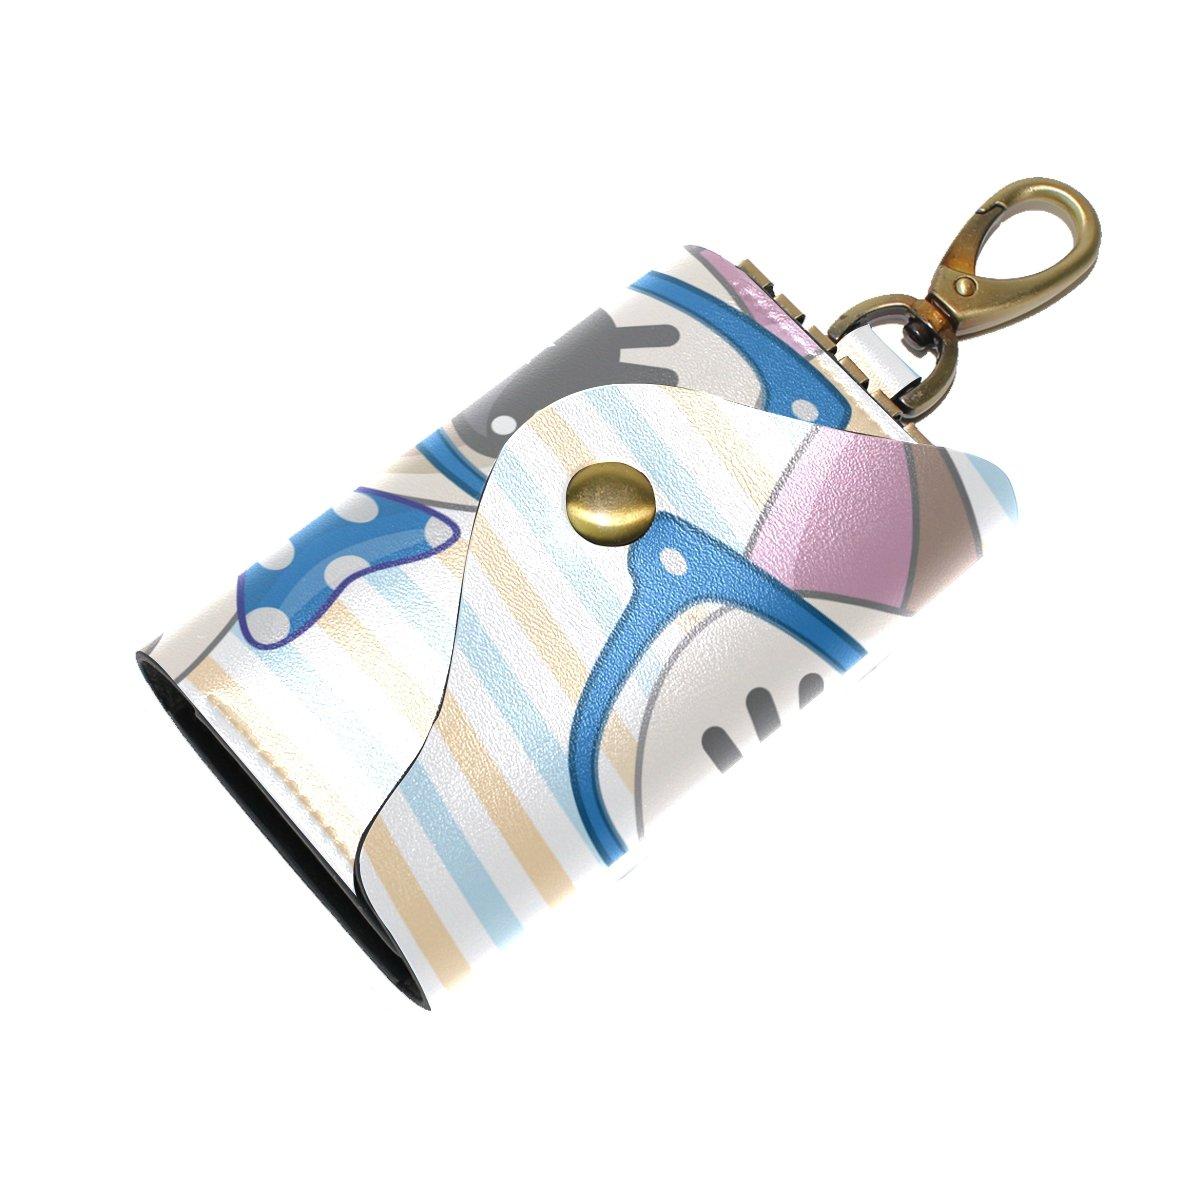 DEYYA Cartoon Cat Kitty Leather Key Case Wallets Unisex Keychain Key Holder with 6 Hooks Snap Closure